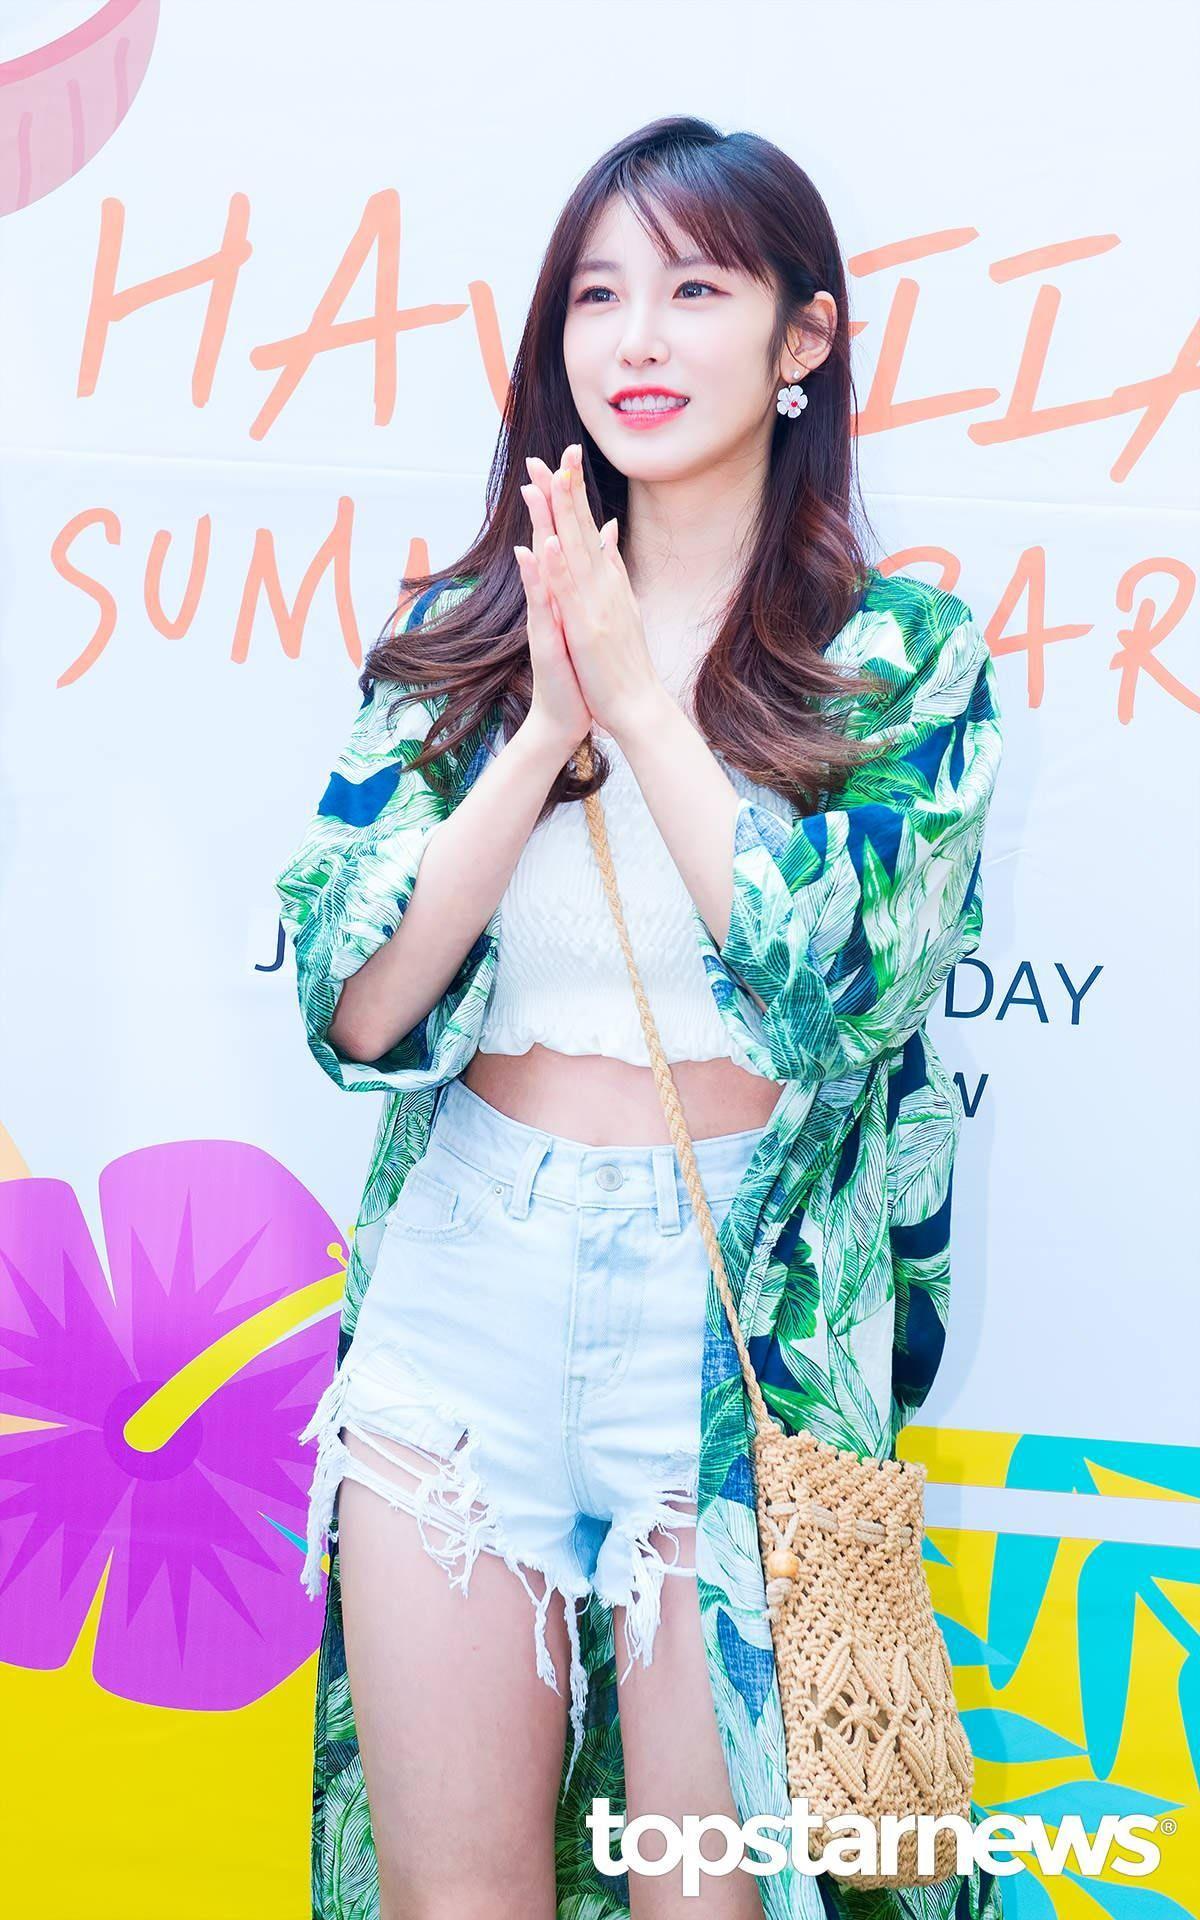 Hyosung Beaesthetic Kpop Fashion Sweet Jeans Korean Girl